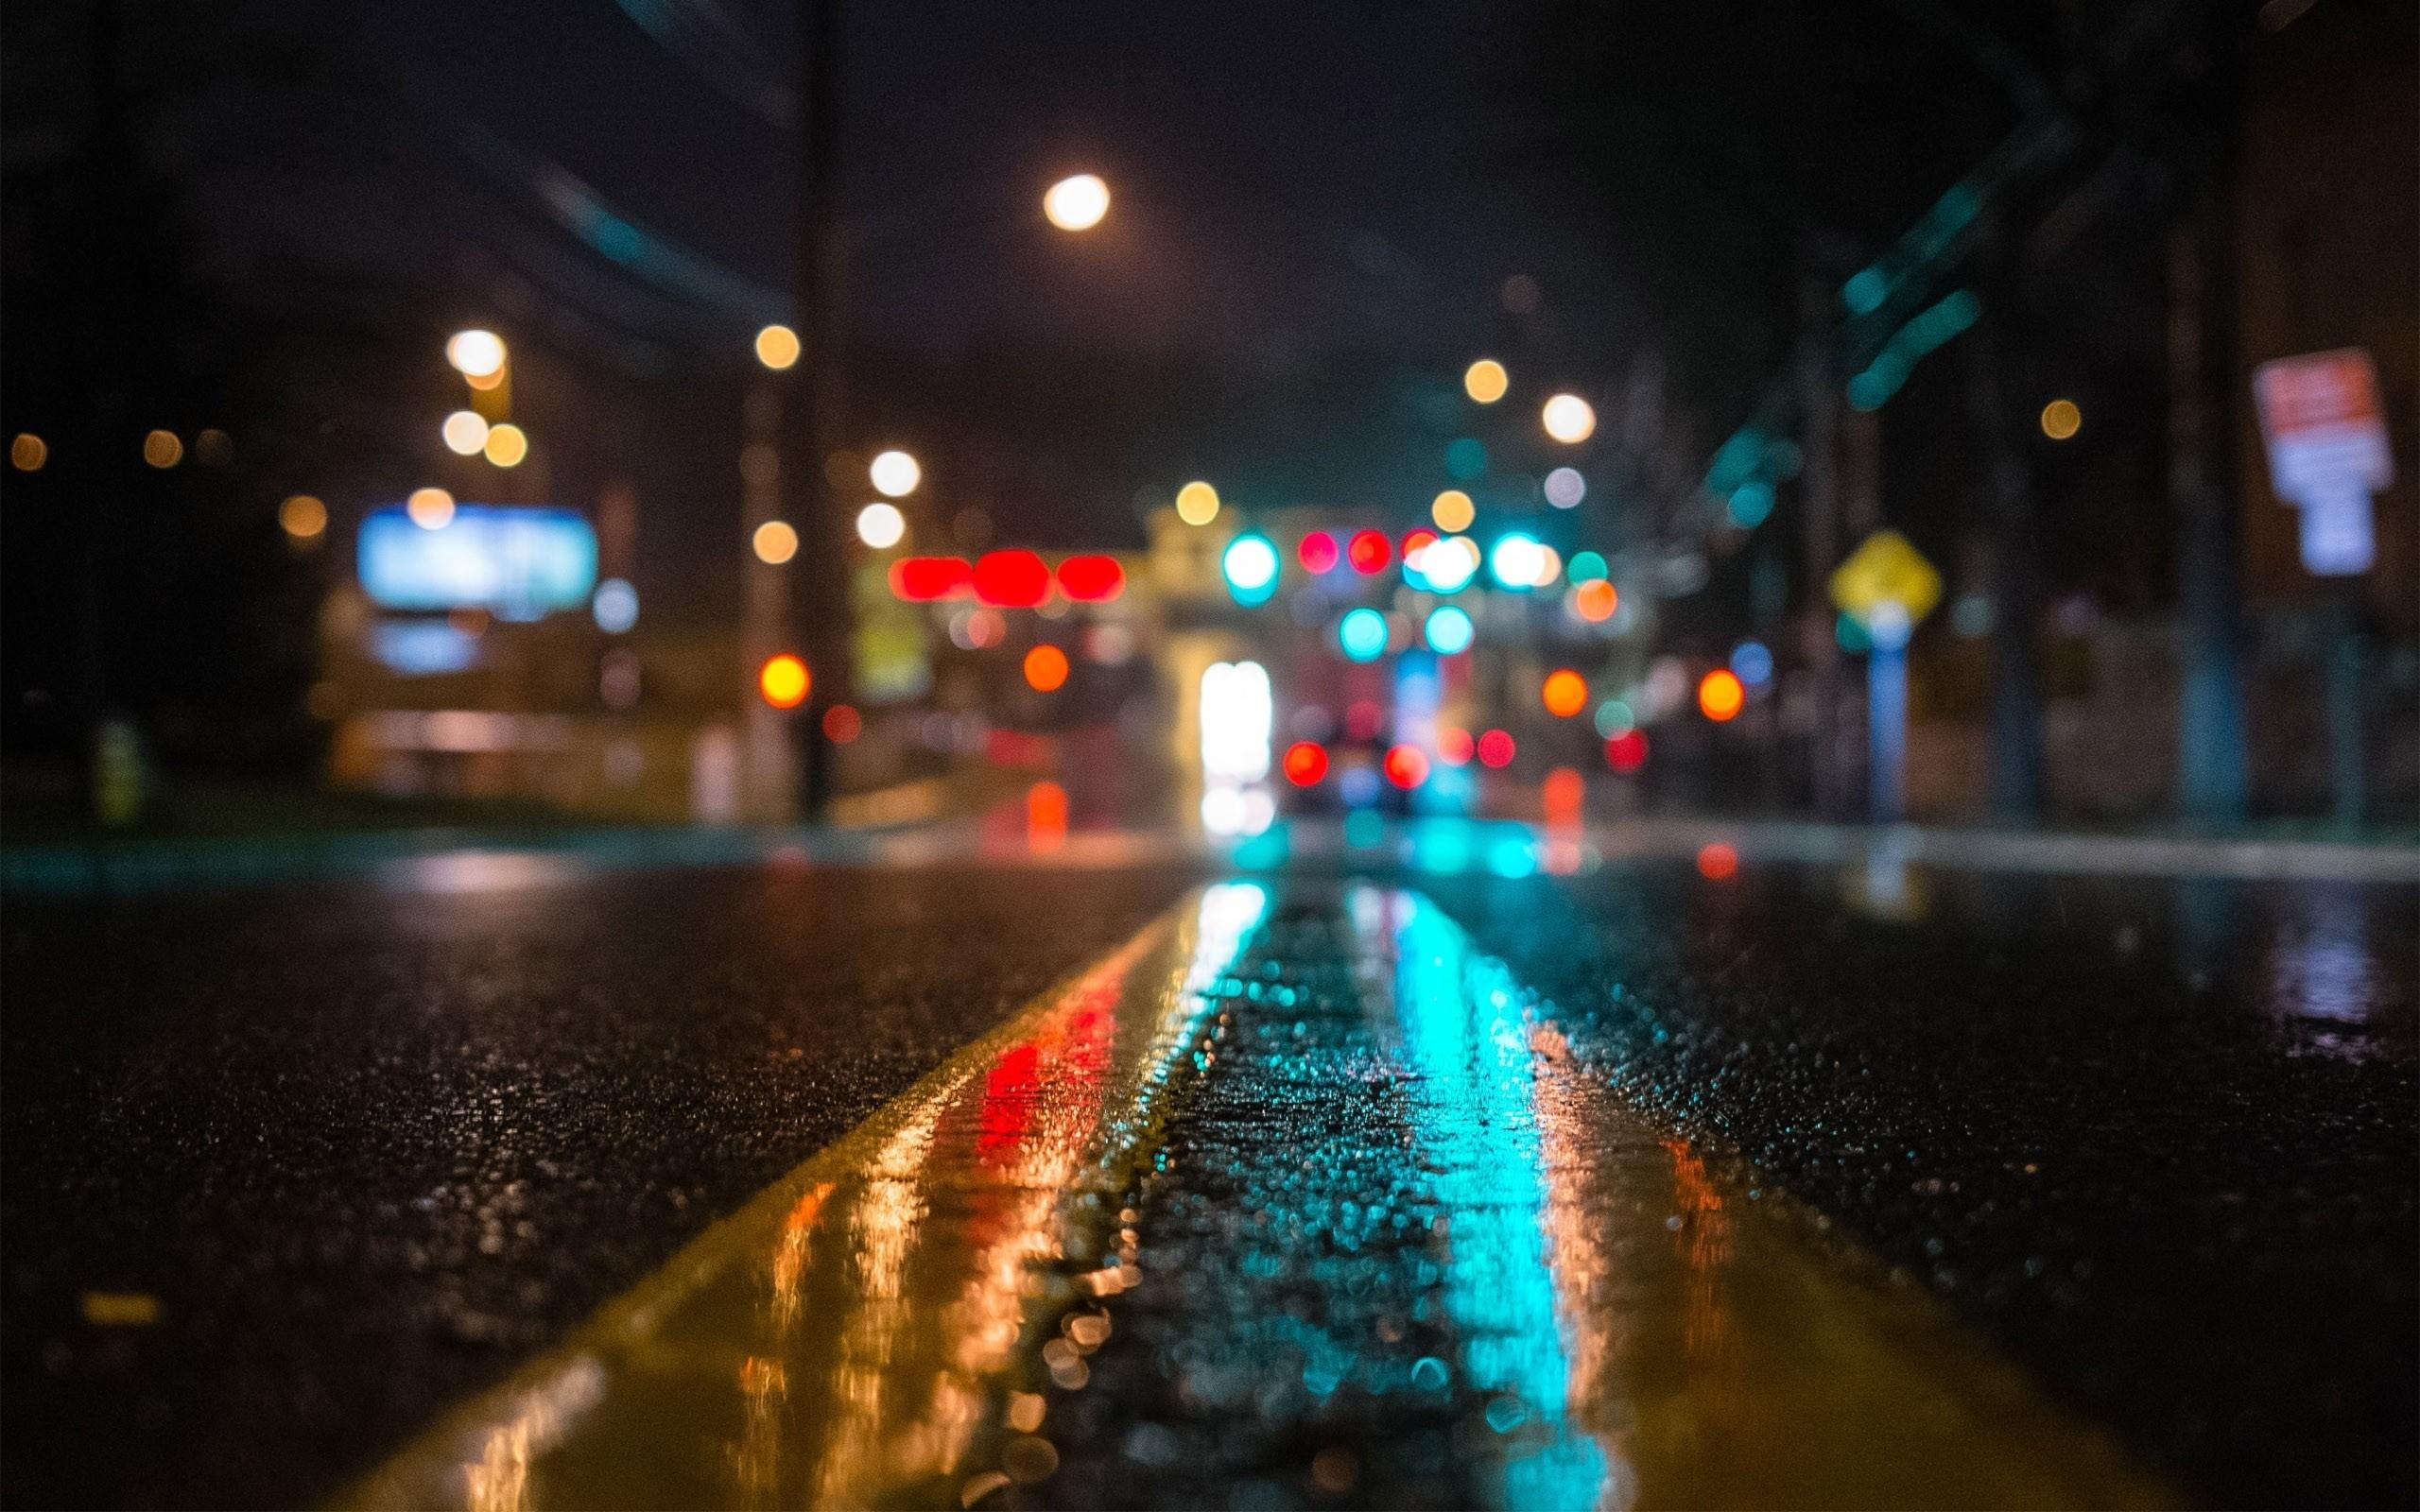 wallpaper.wiki-New-york-street-wet-road-lights-